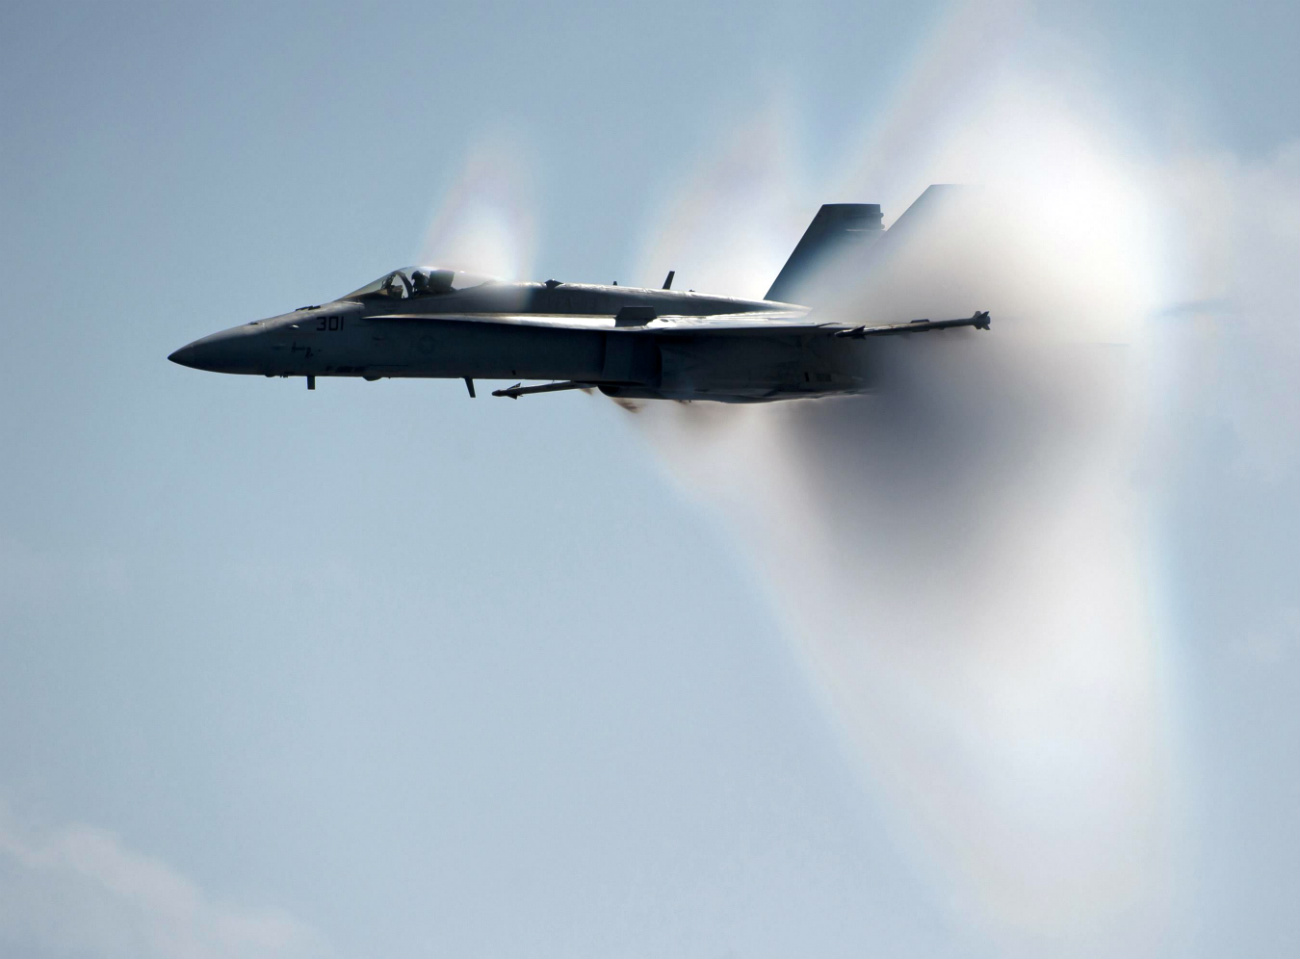 FA-18C Hornet breaks the sound barrier alongside the Nimitz-class aircraft carrier